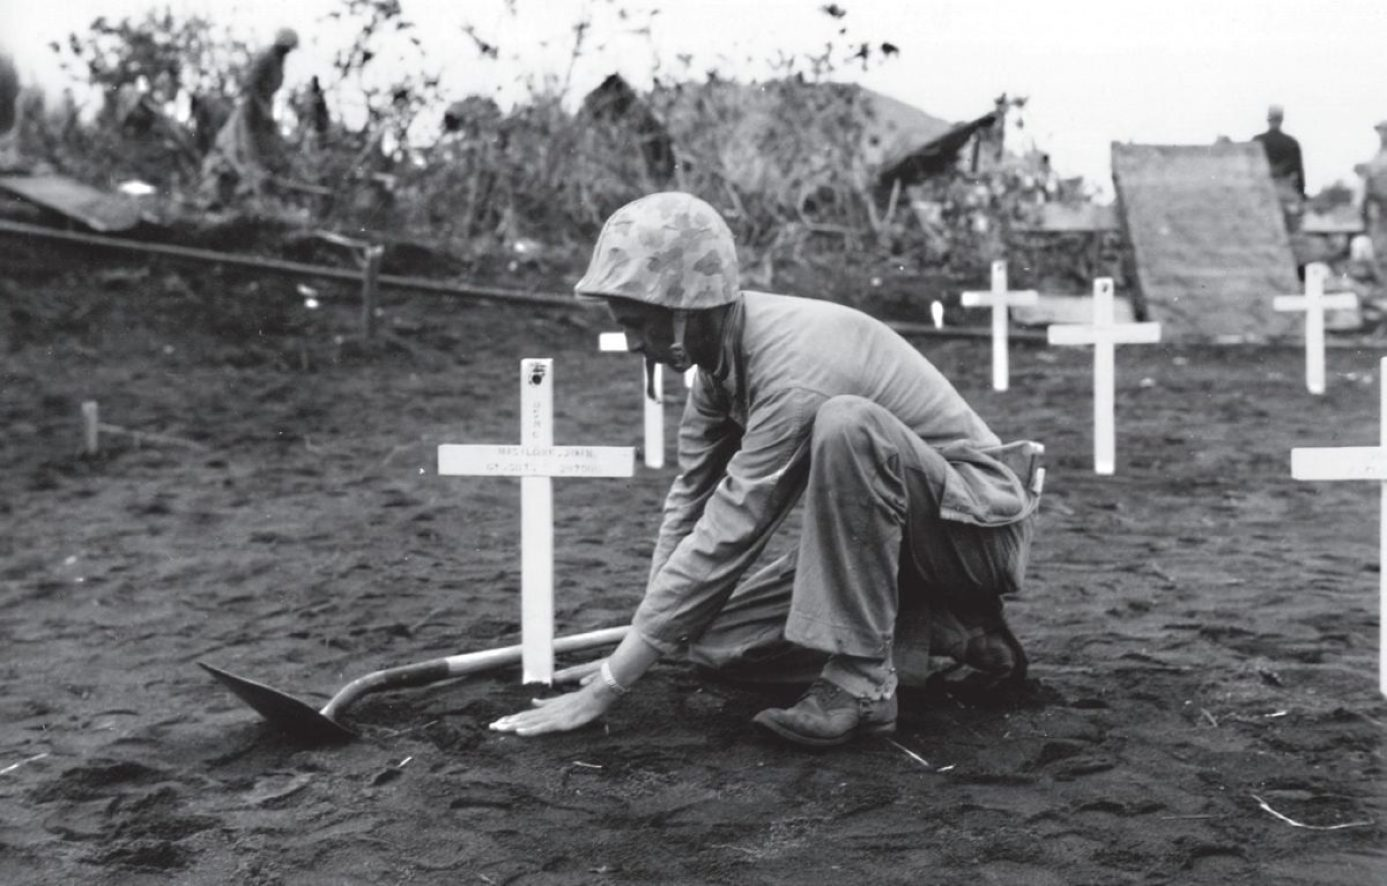 Iwo Jima Marine Tends to Grave